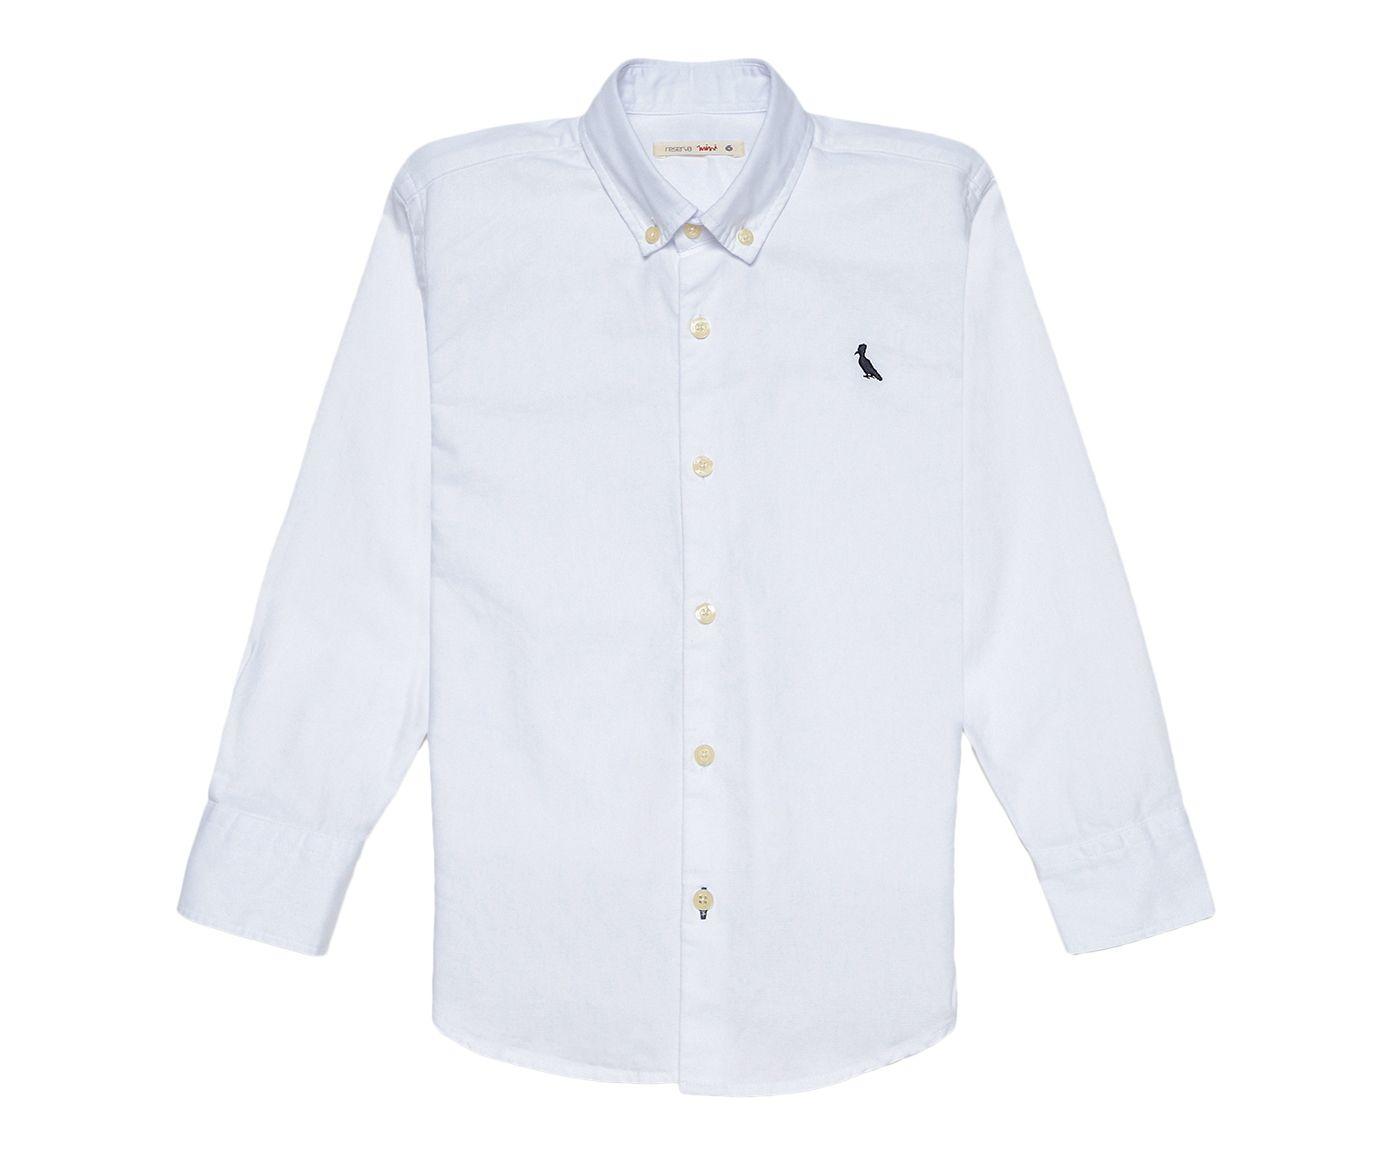 Camisa Infantil Reserva Mini Oxford Branca, 12 + | Westwing.com.br